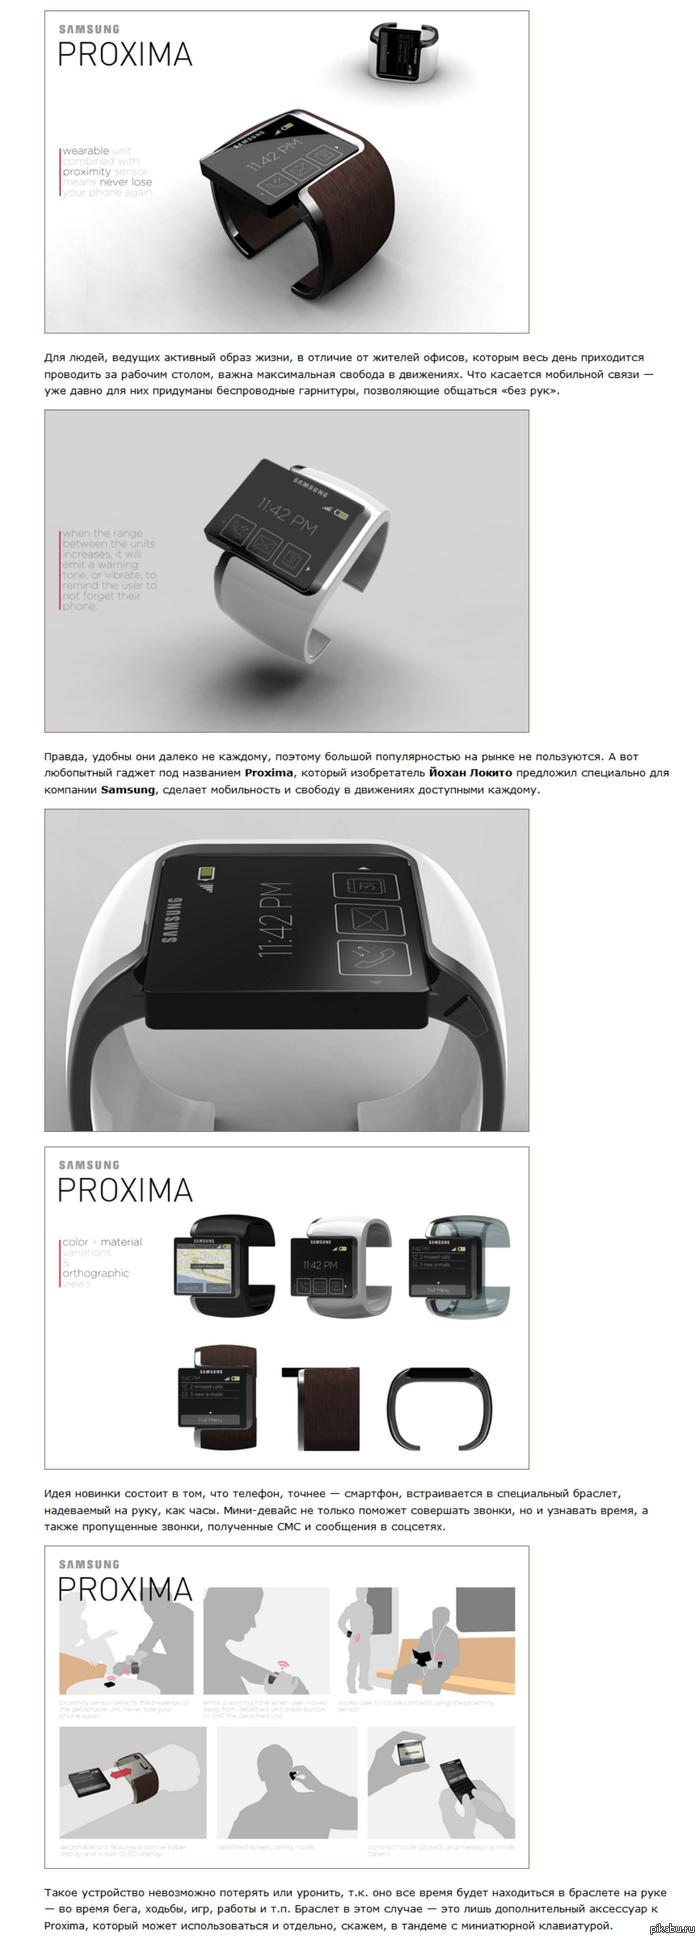 Samsung Proxima, телефон-часы. Длиннопост http://t-human.com/journal/samsung-proxima-telefon-i-chasy-na-ruku-v-odnom/